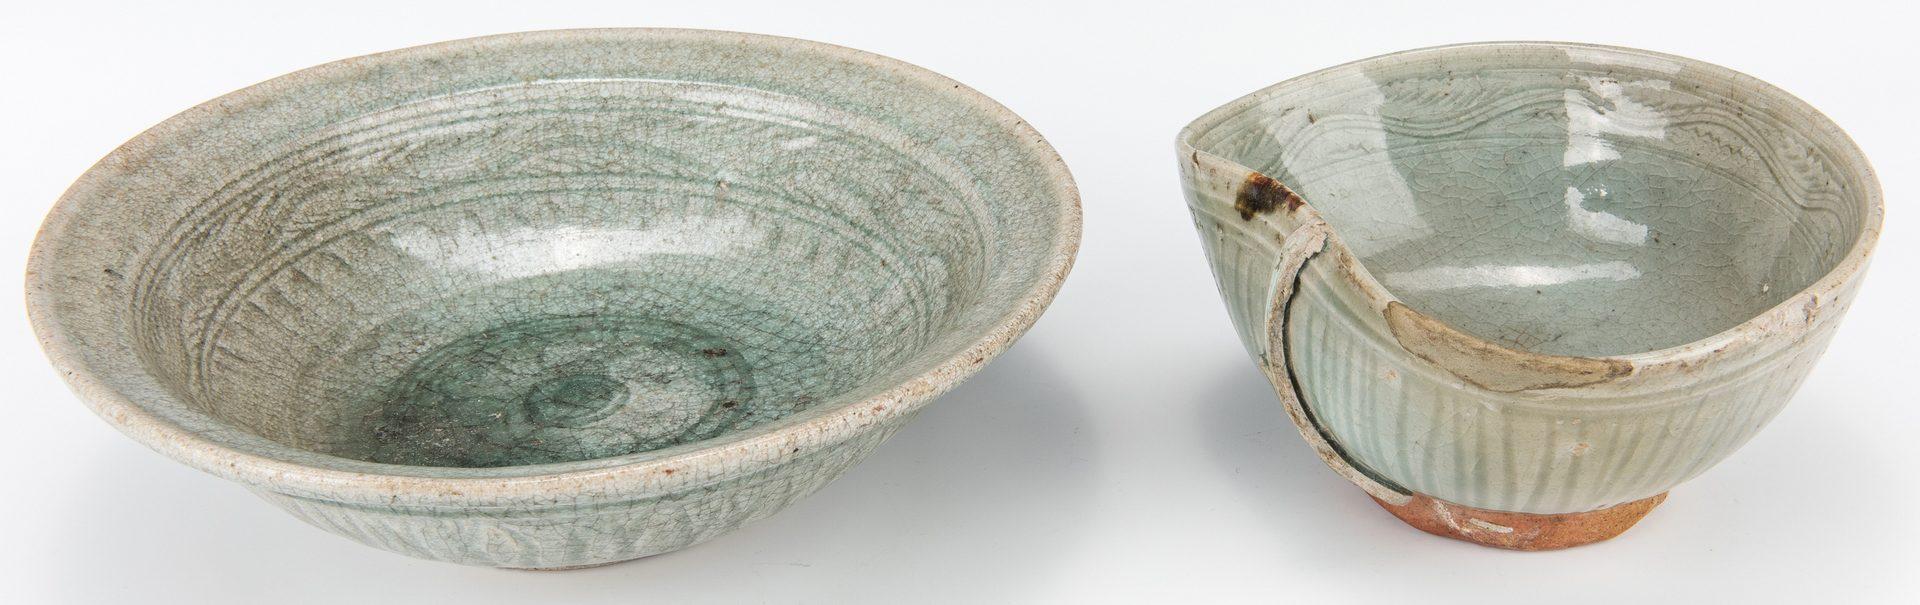 Lot 410: 2 Asian Celadon Glazed Bowls